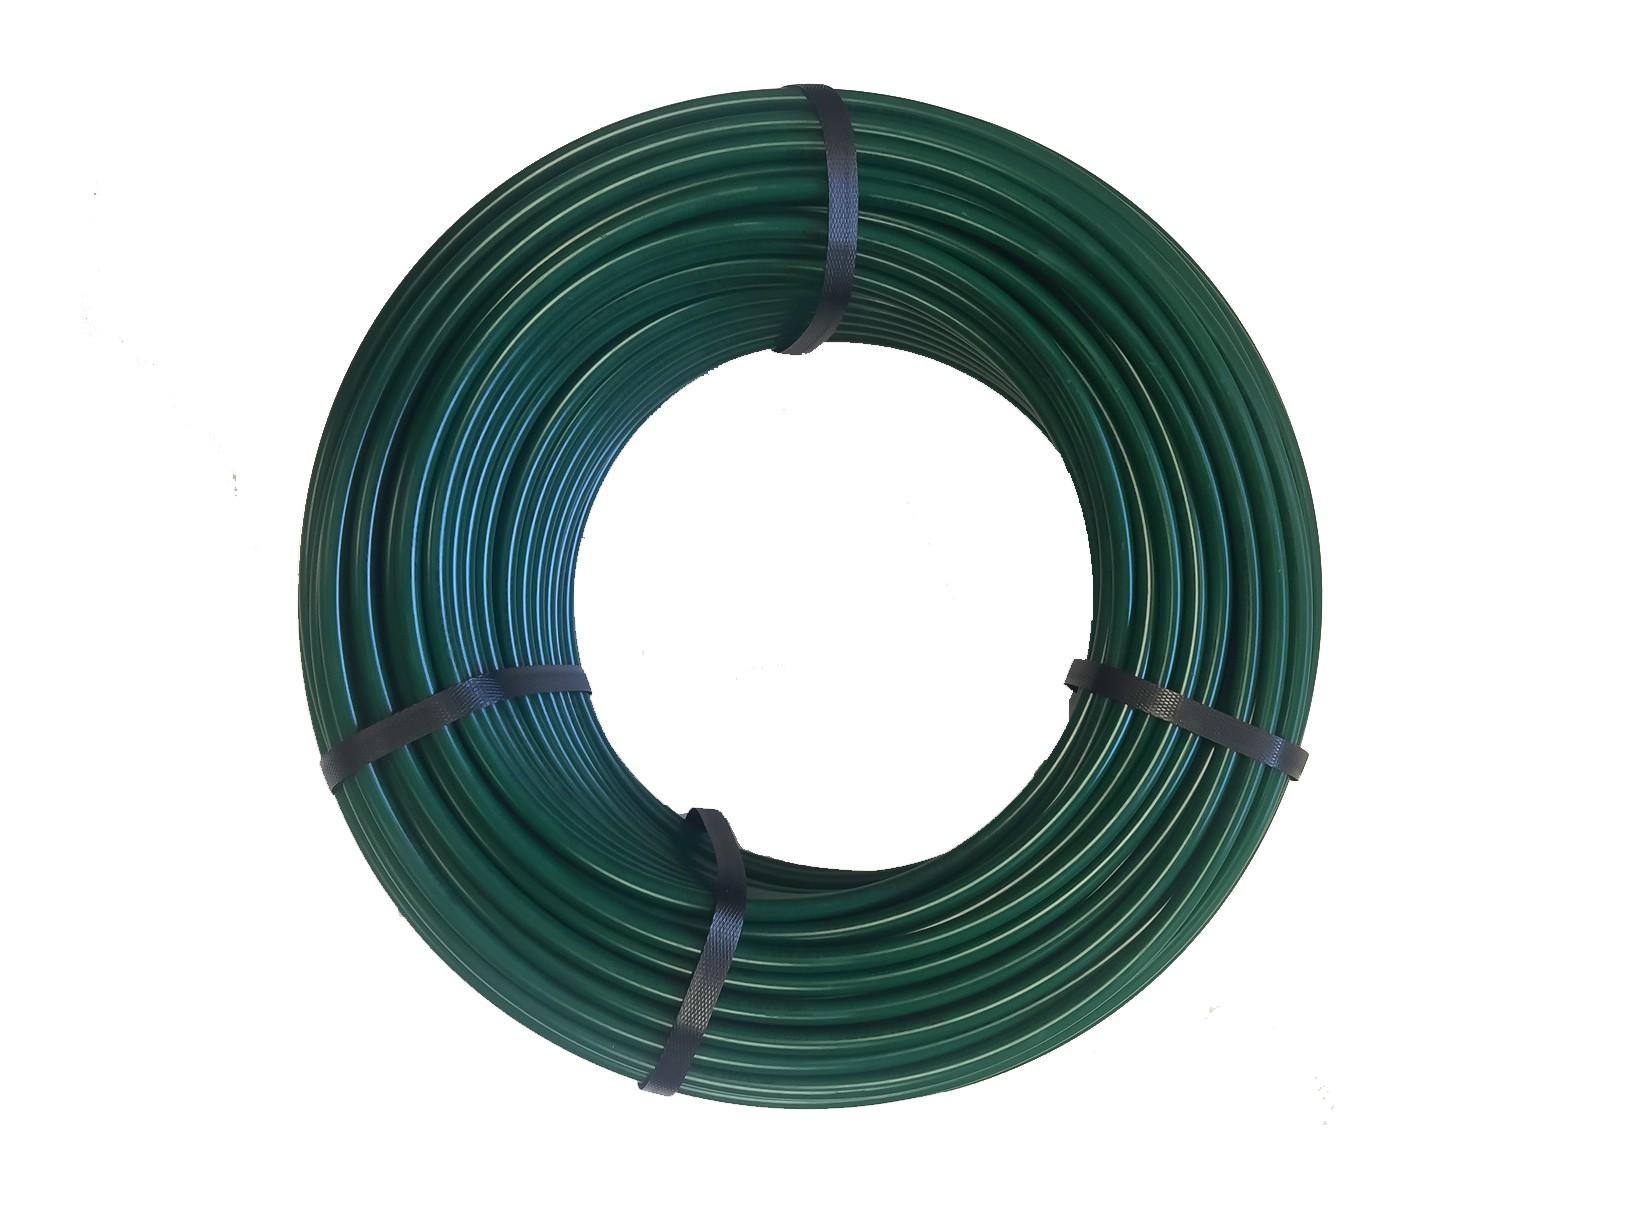 "MDPE 250 X 3/8"" Green"